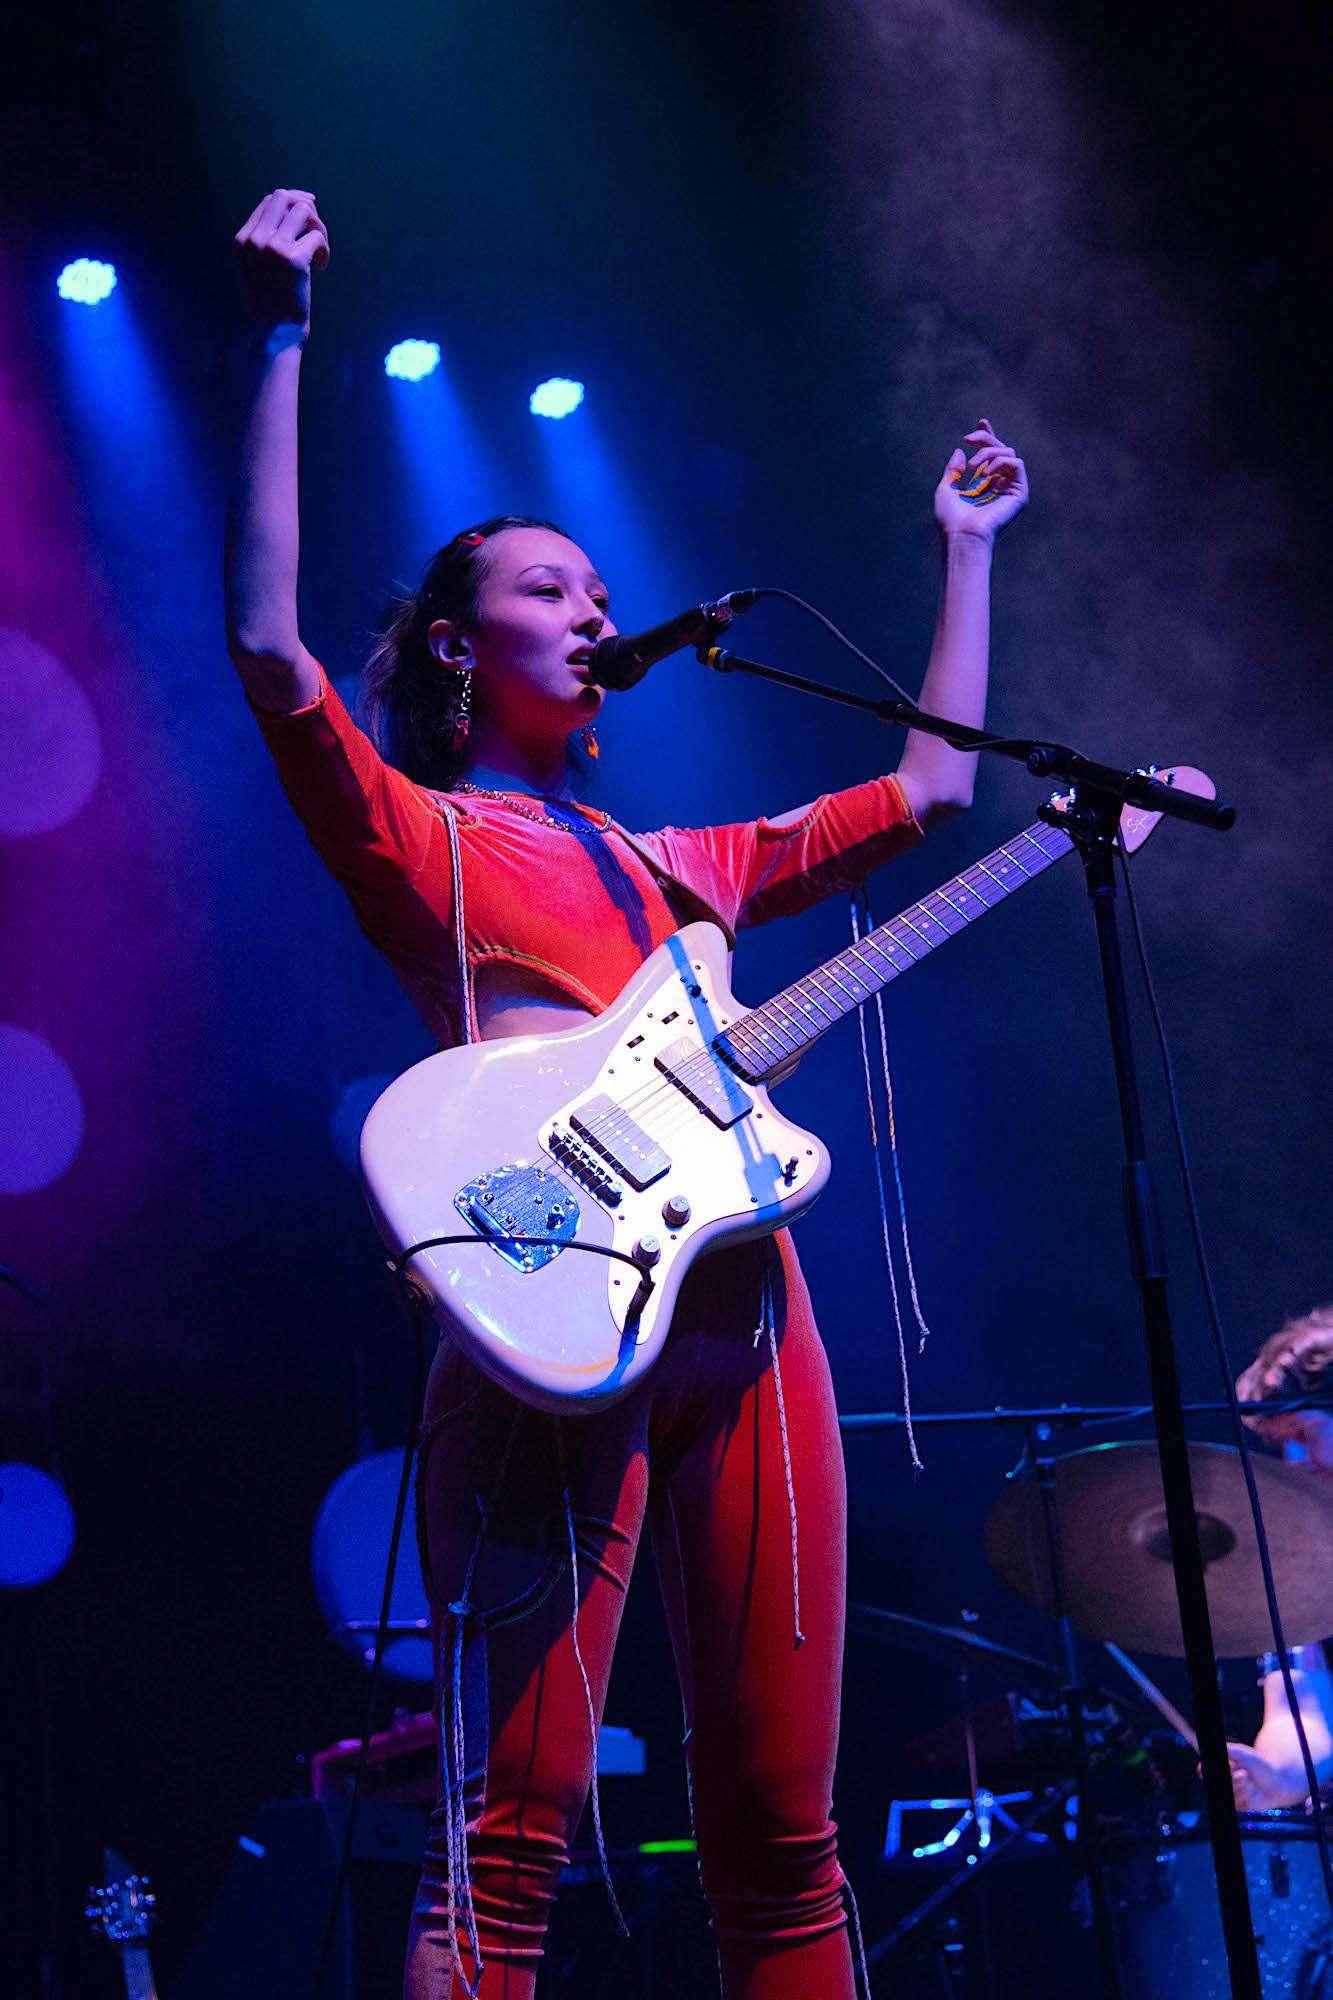 Luna Li Live at Thalia Hall [GALLERY] 7